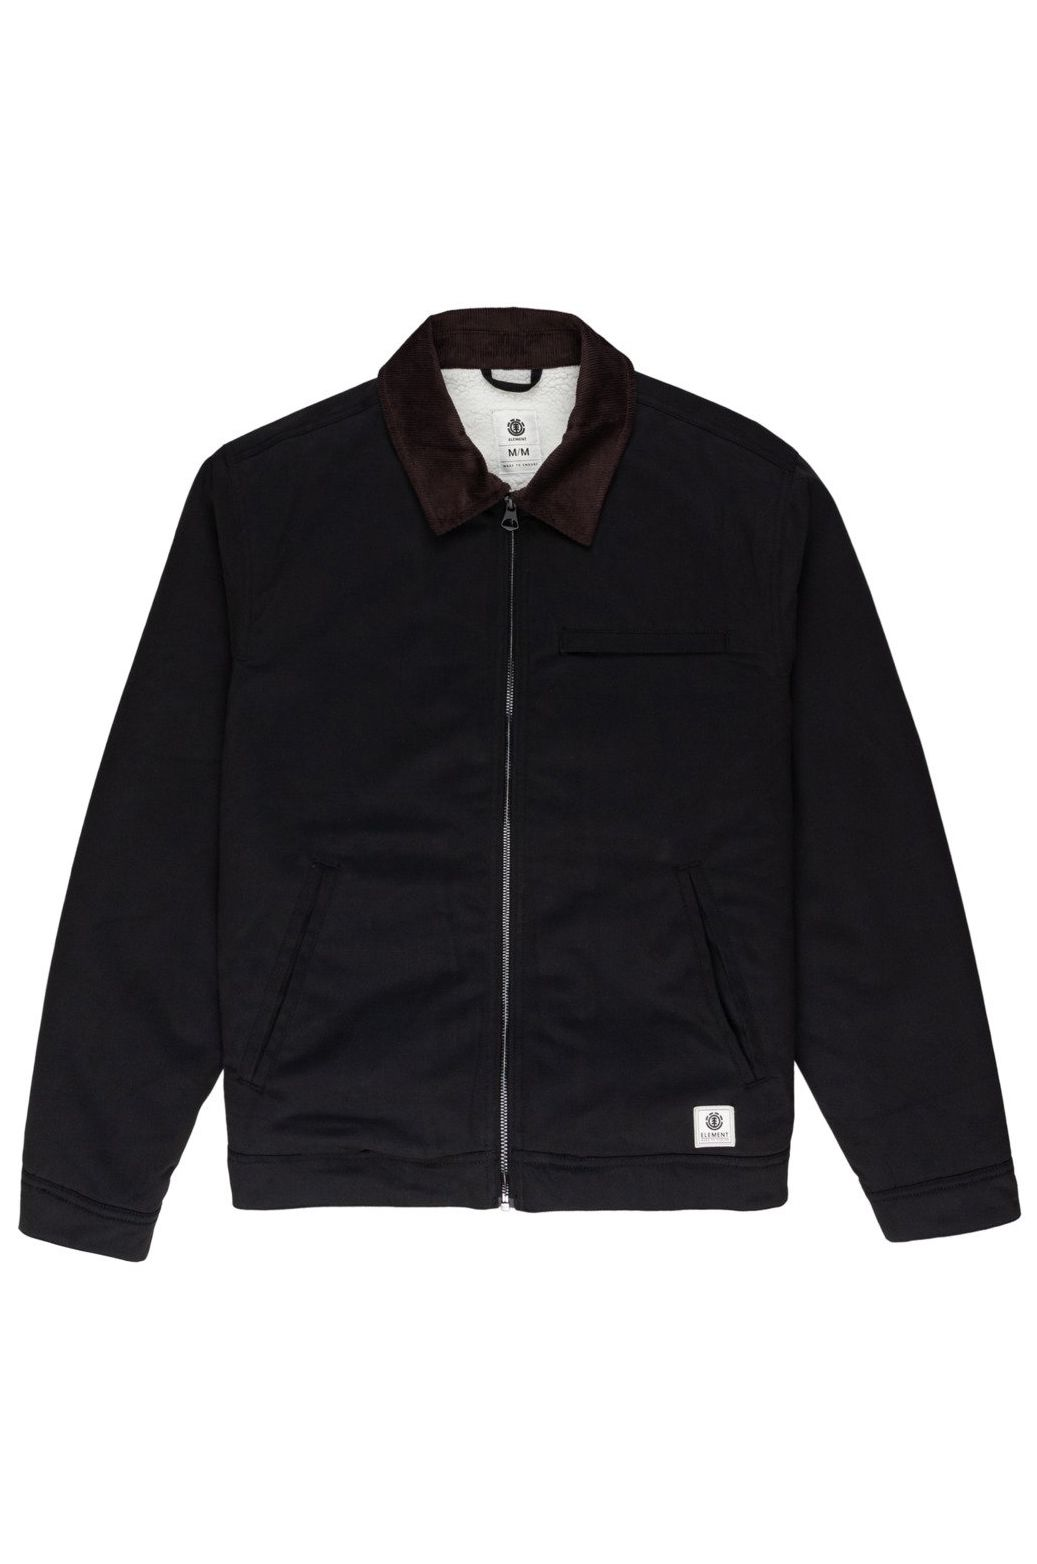 Element Jacket CRAFTMAN SHERPA WOLFEBORO Flint Black